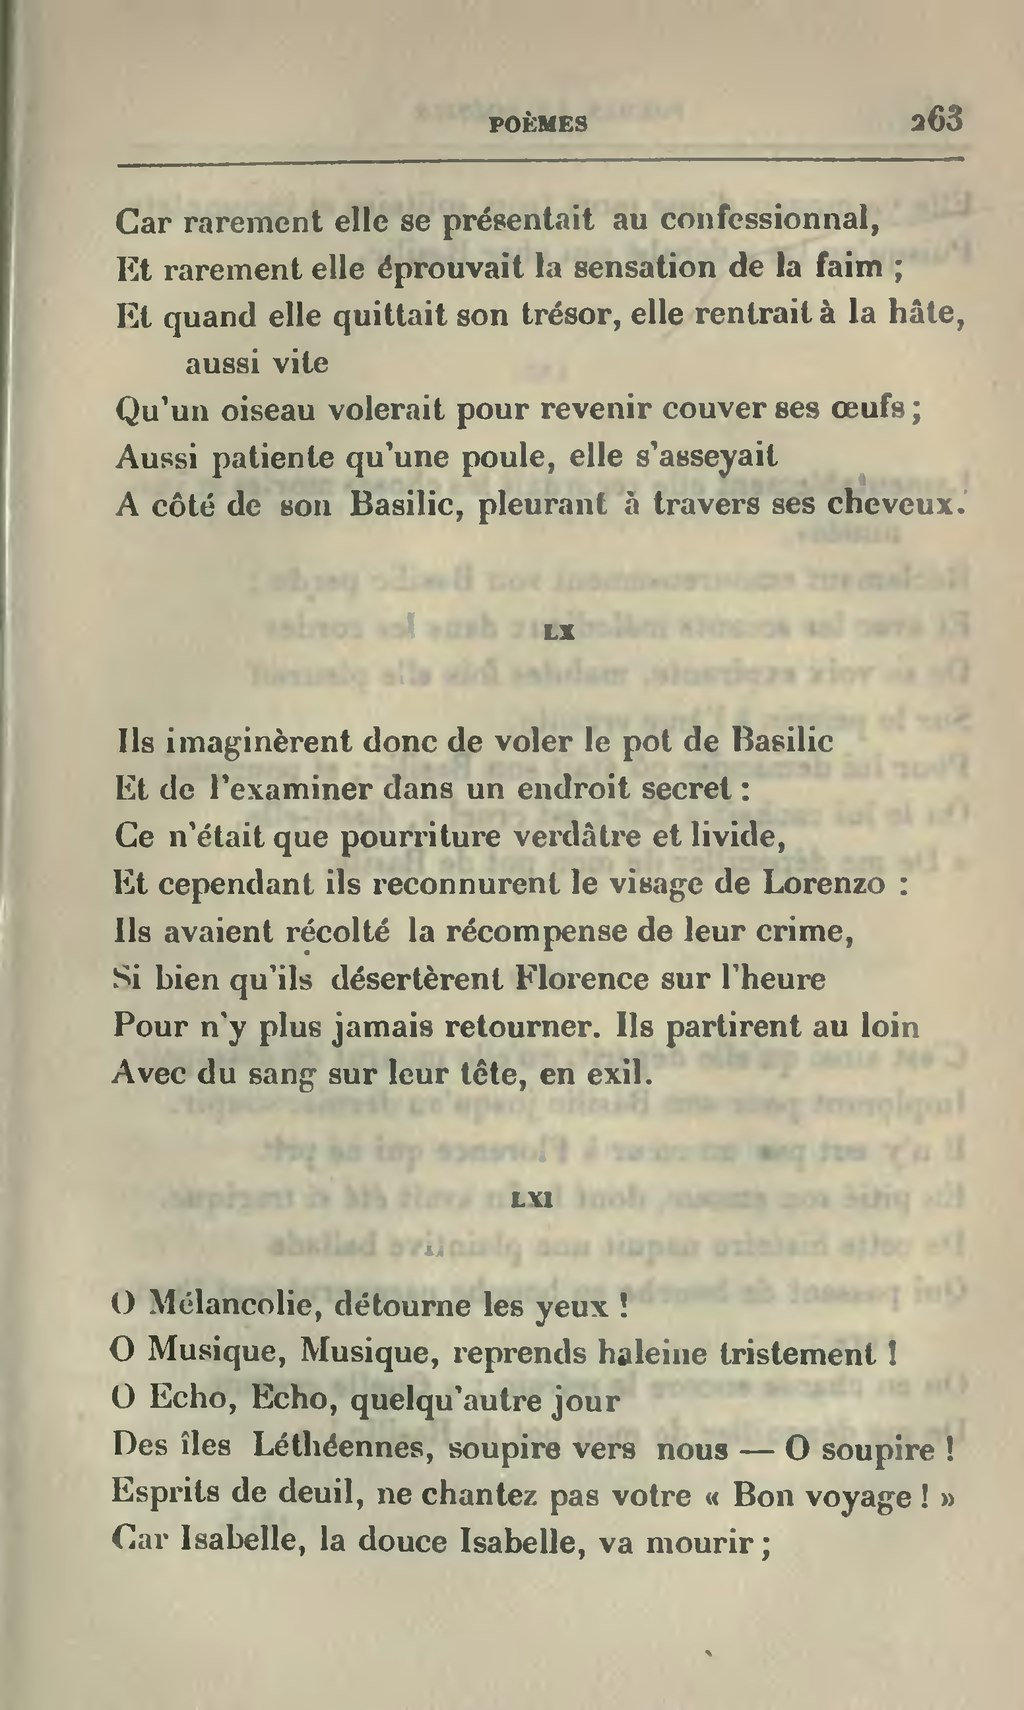 Pagekeats Poèmes Et Poésies Trad Gallimard 1910djvu